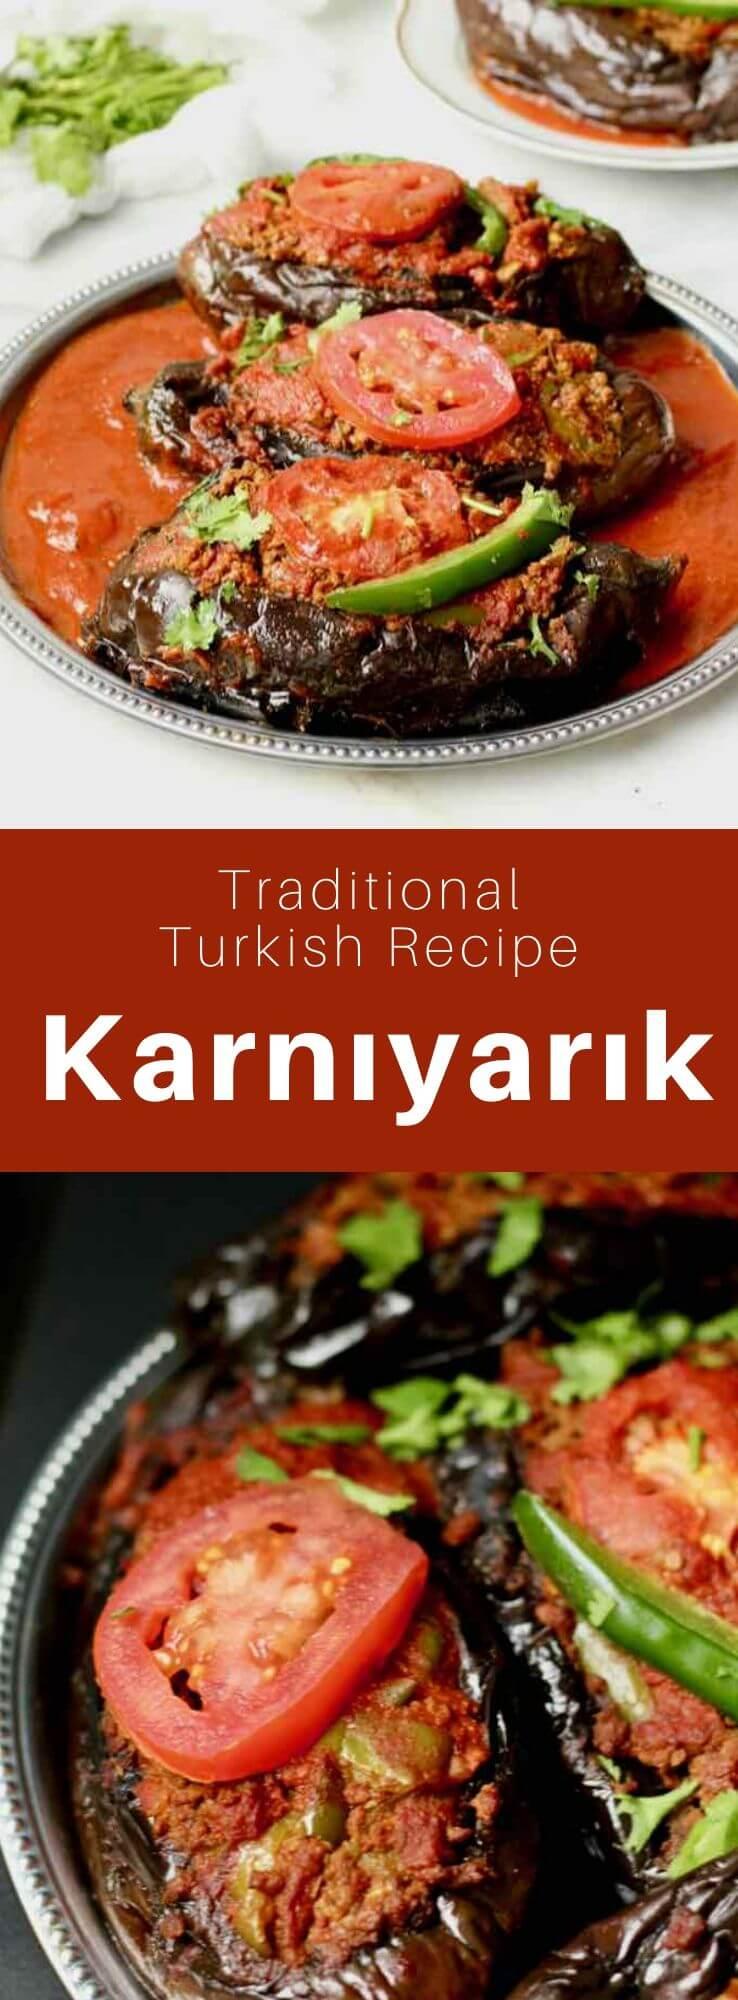 Karnıyarık, which means